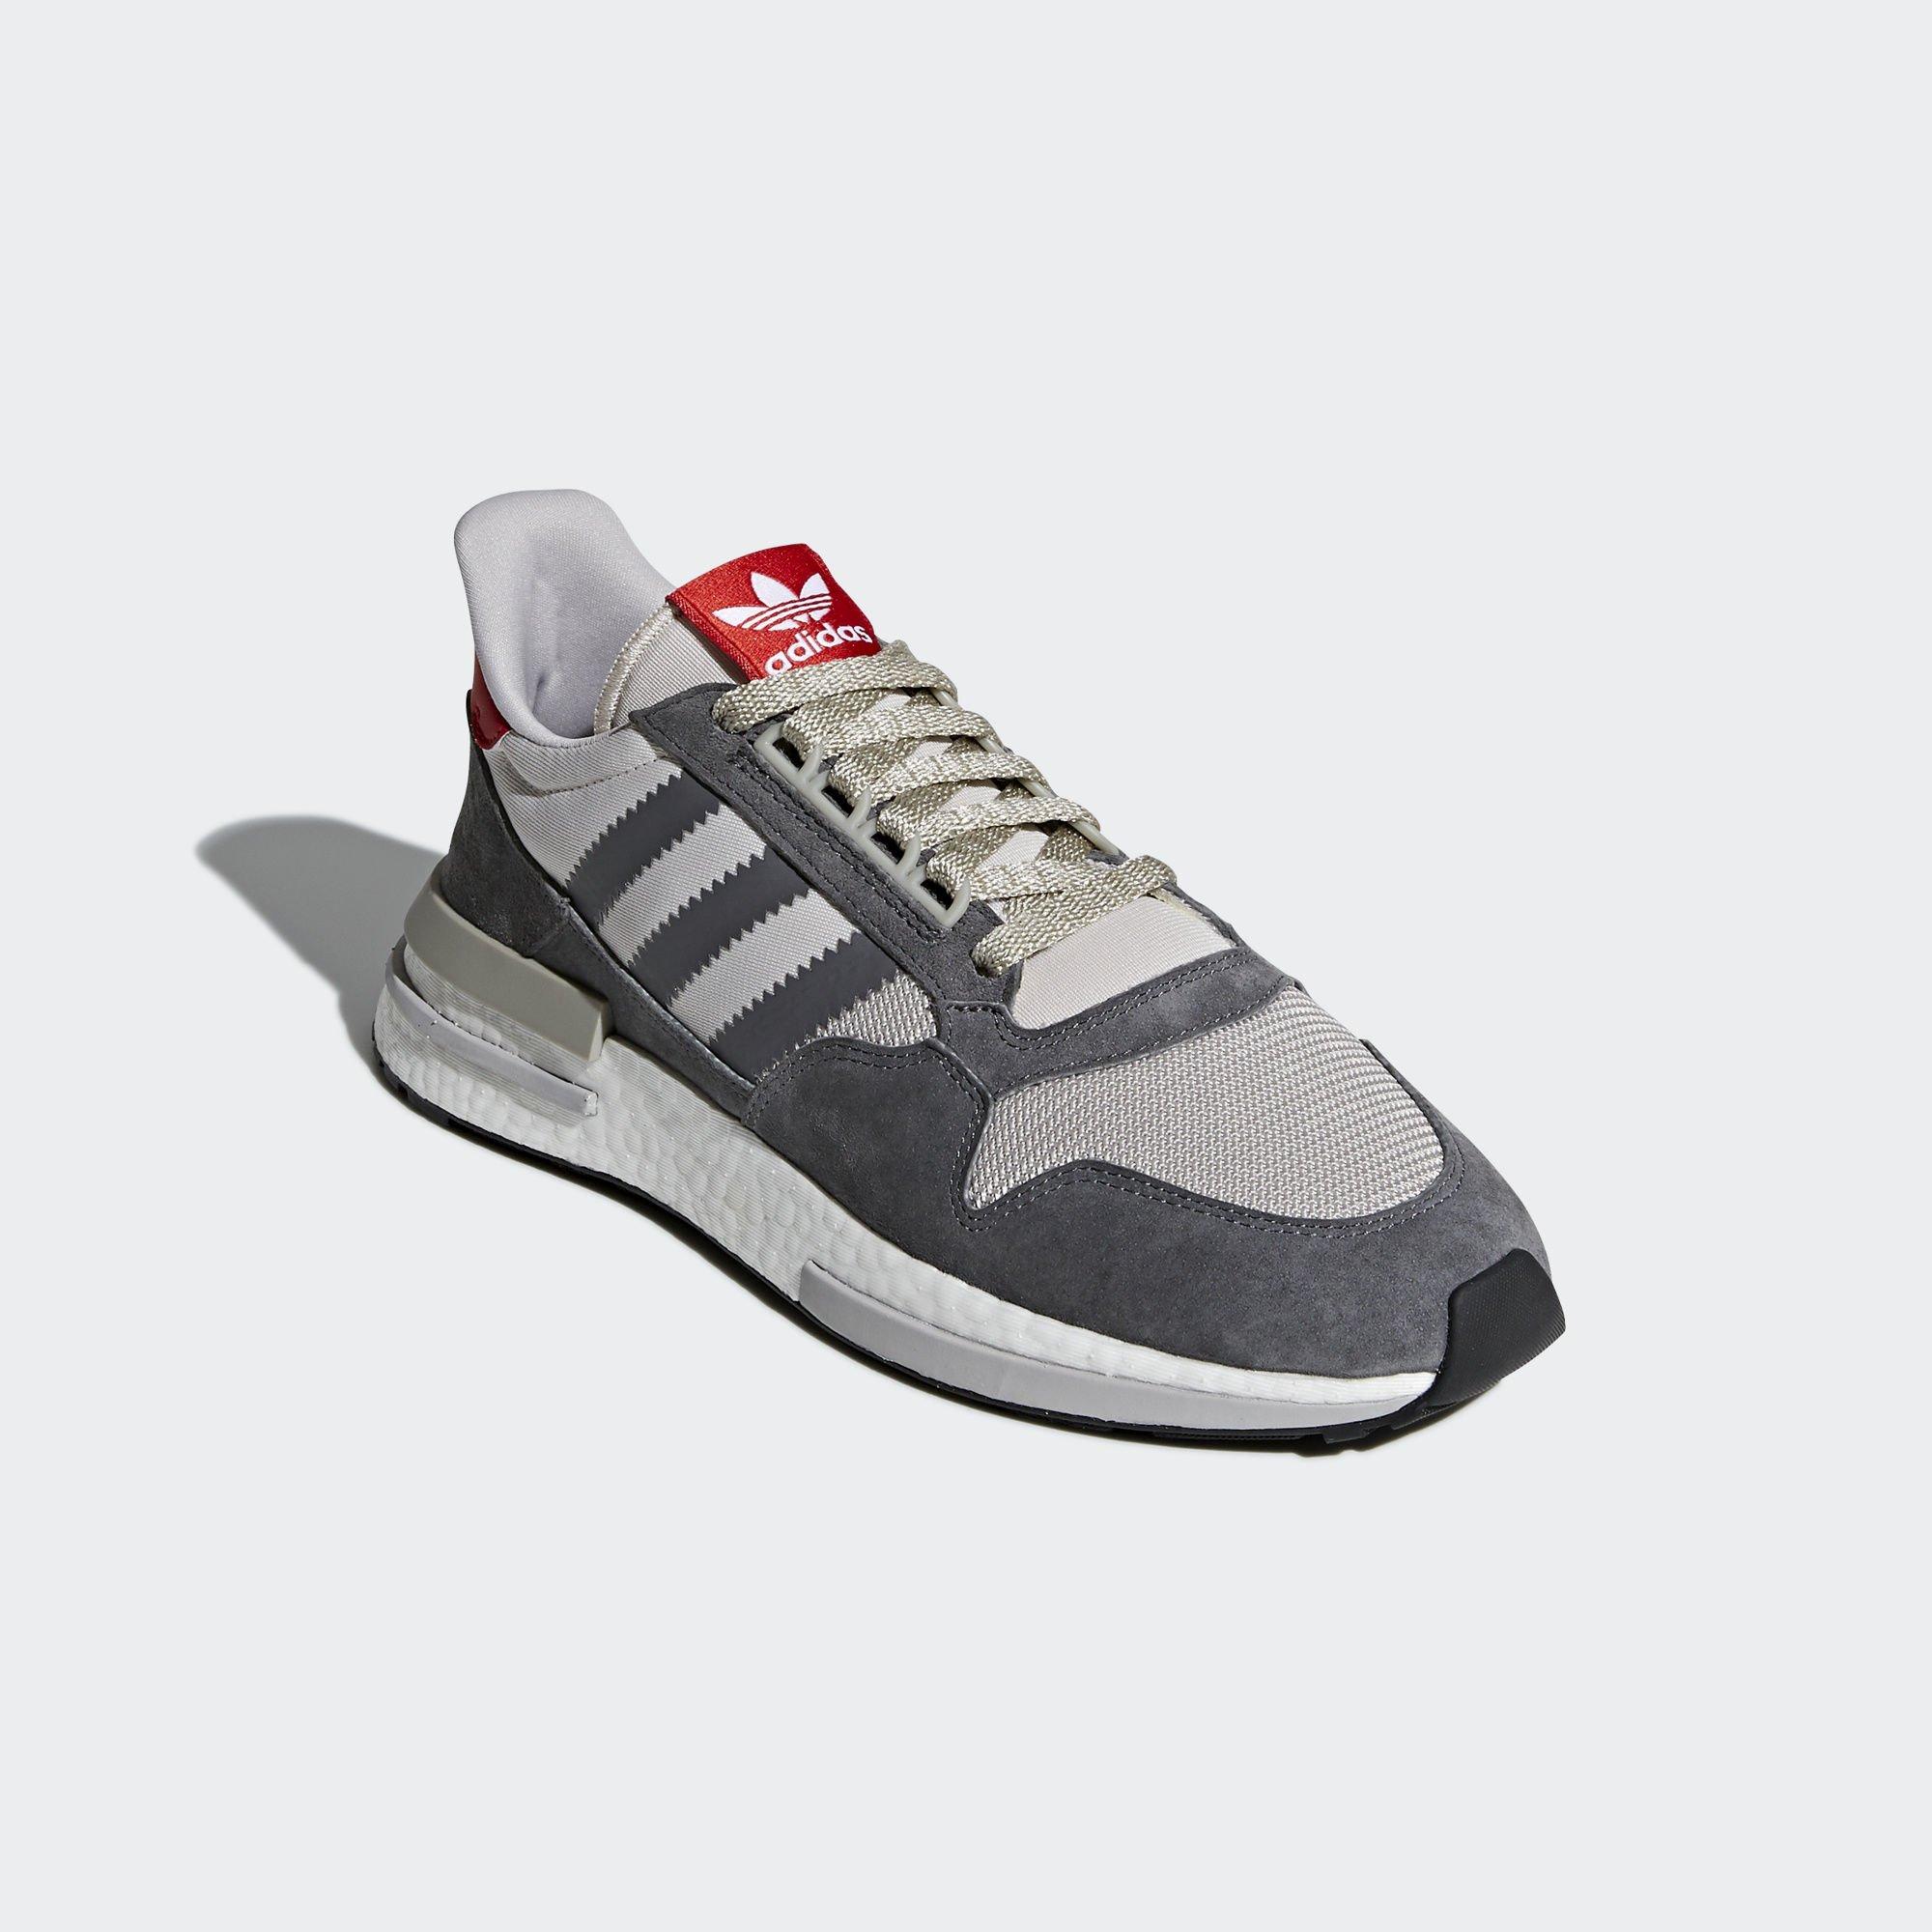 adidas ZX 500 RM 'Grey/White' (B42204)